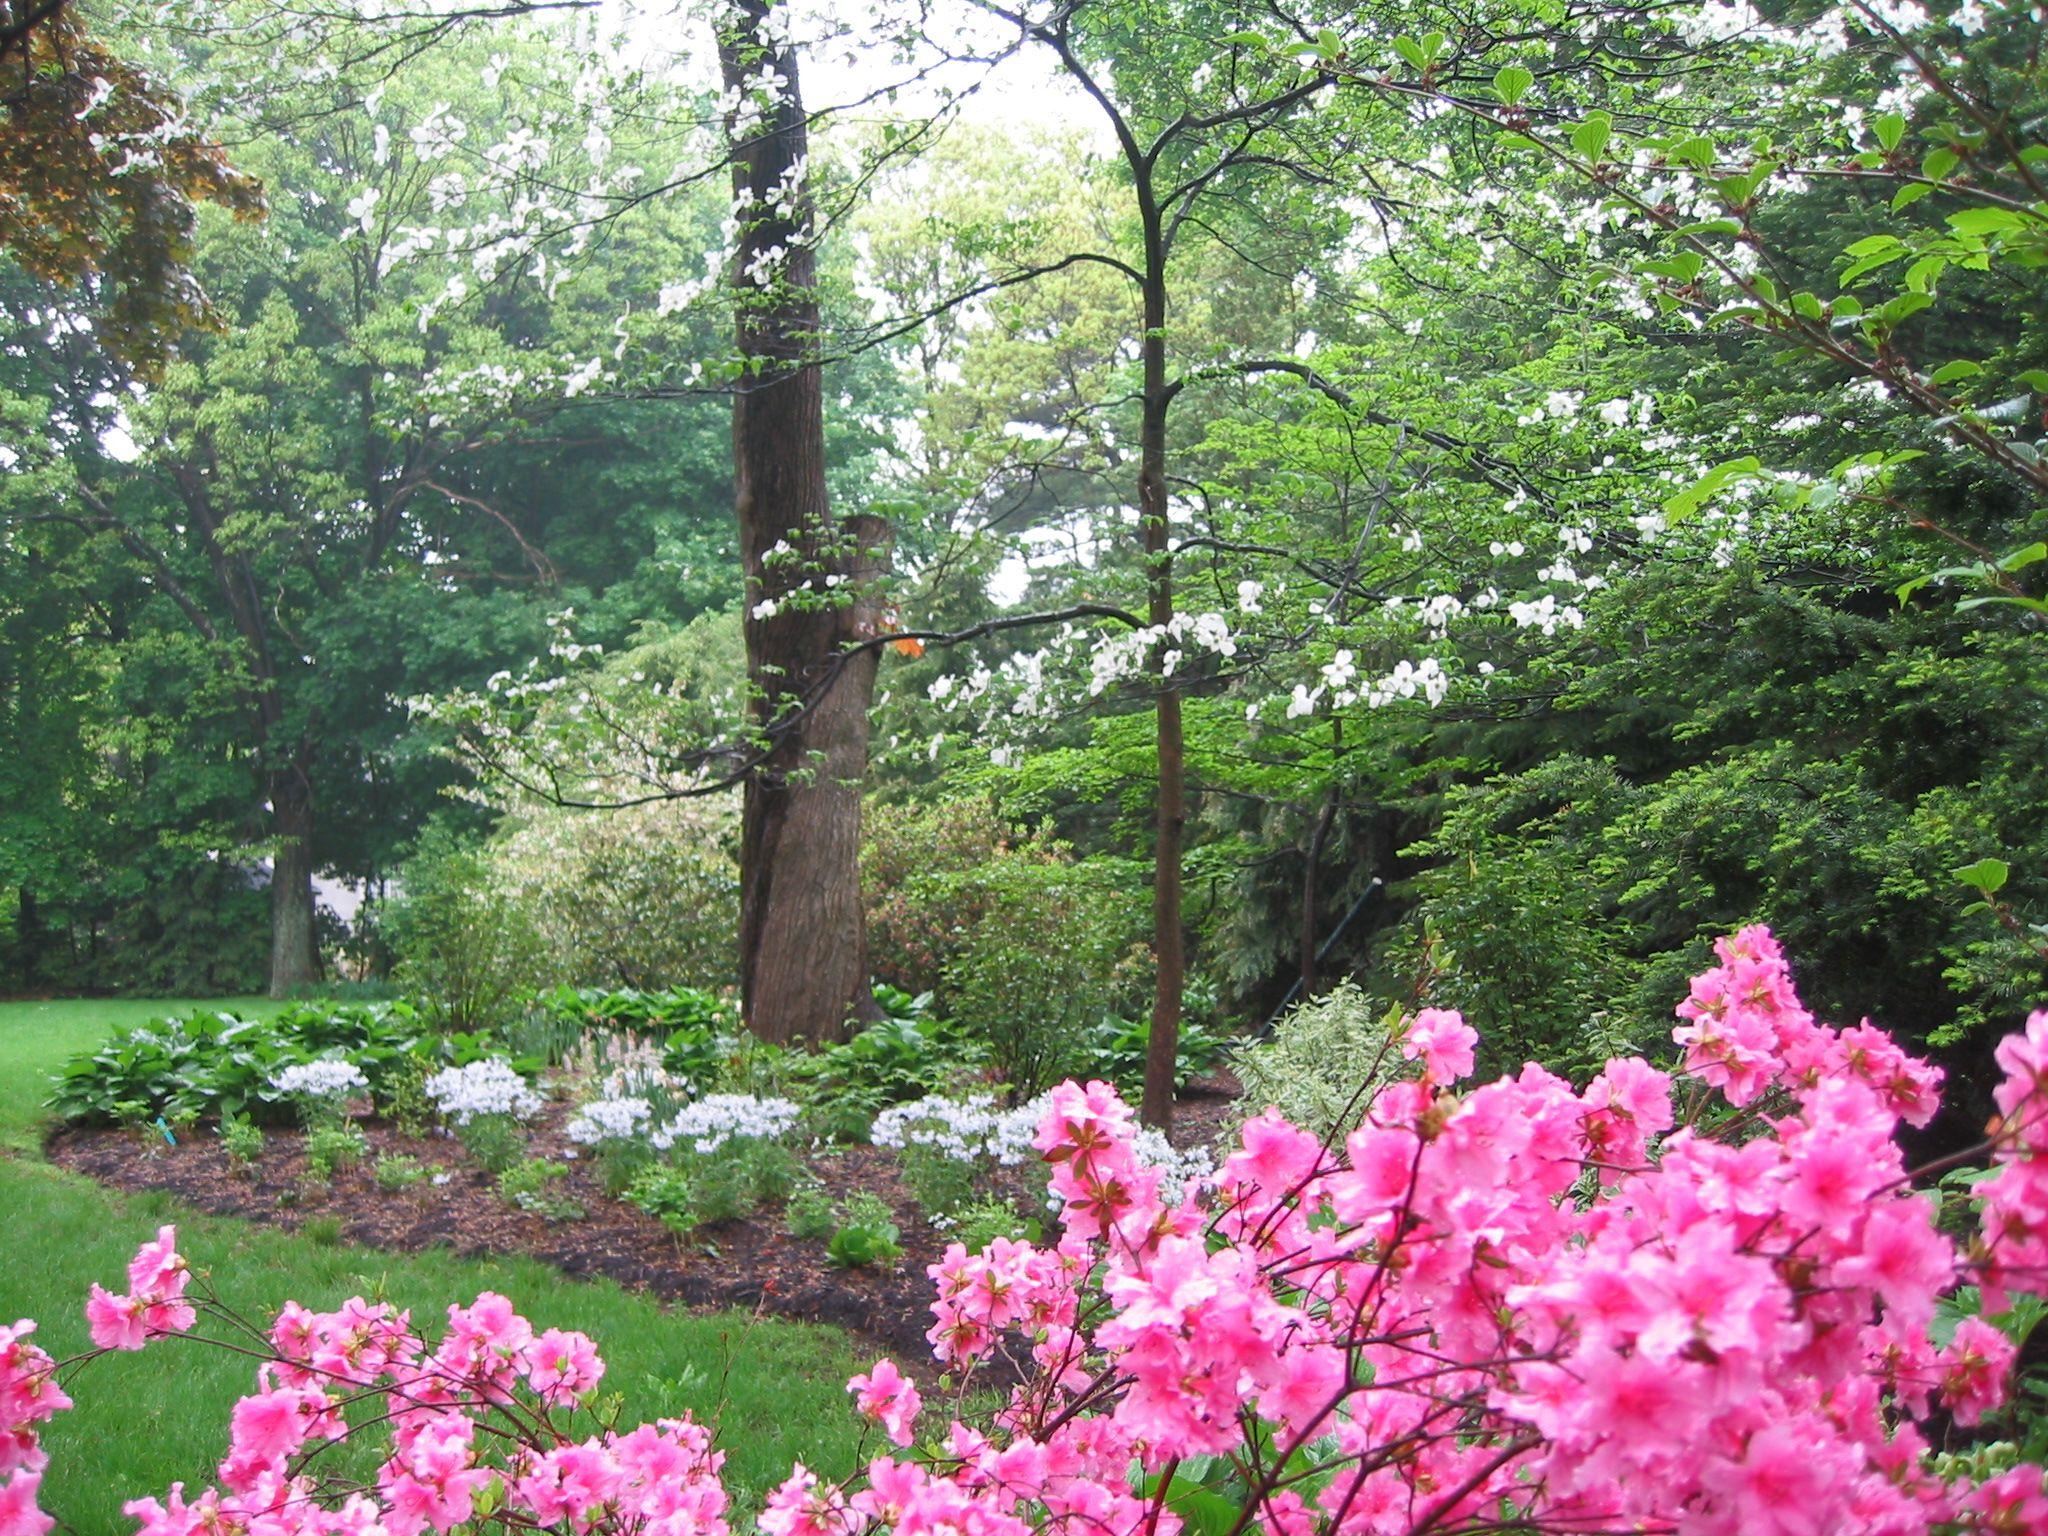 Perennial Gardens Planting Roger B Sturgis Associates Landscaping Framingham Landscape Design Services Plants Woodland Garden